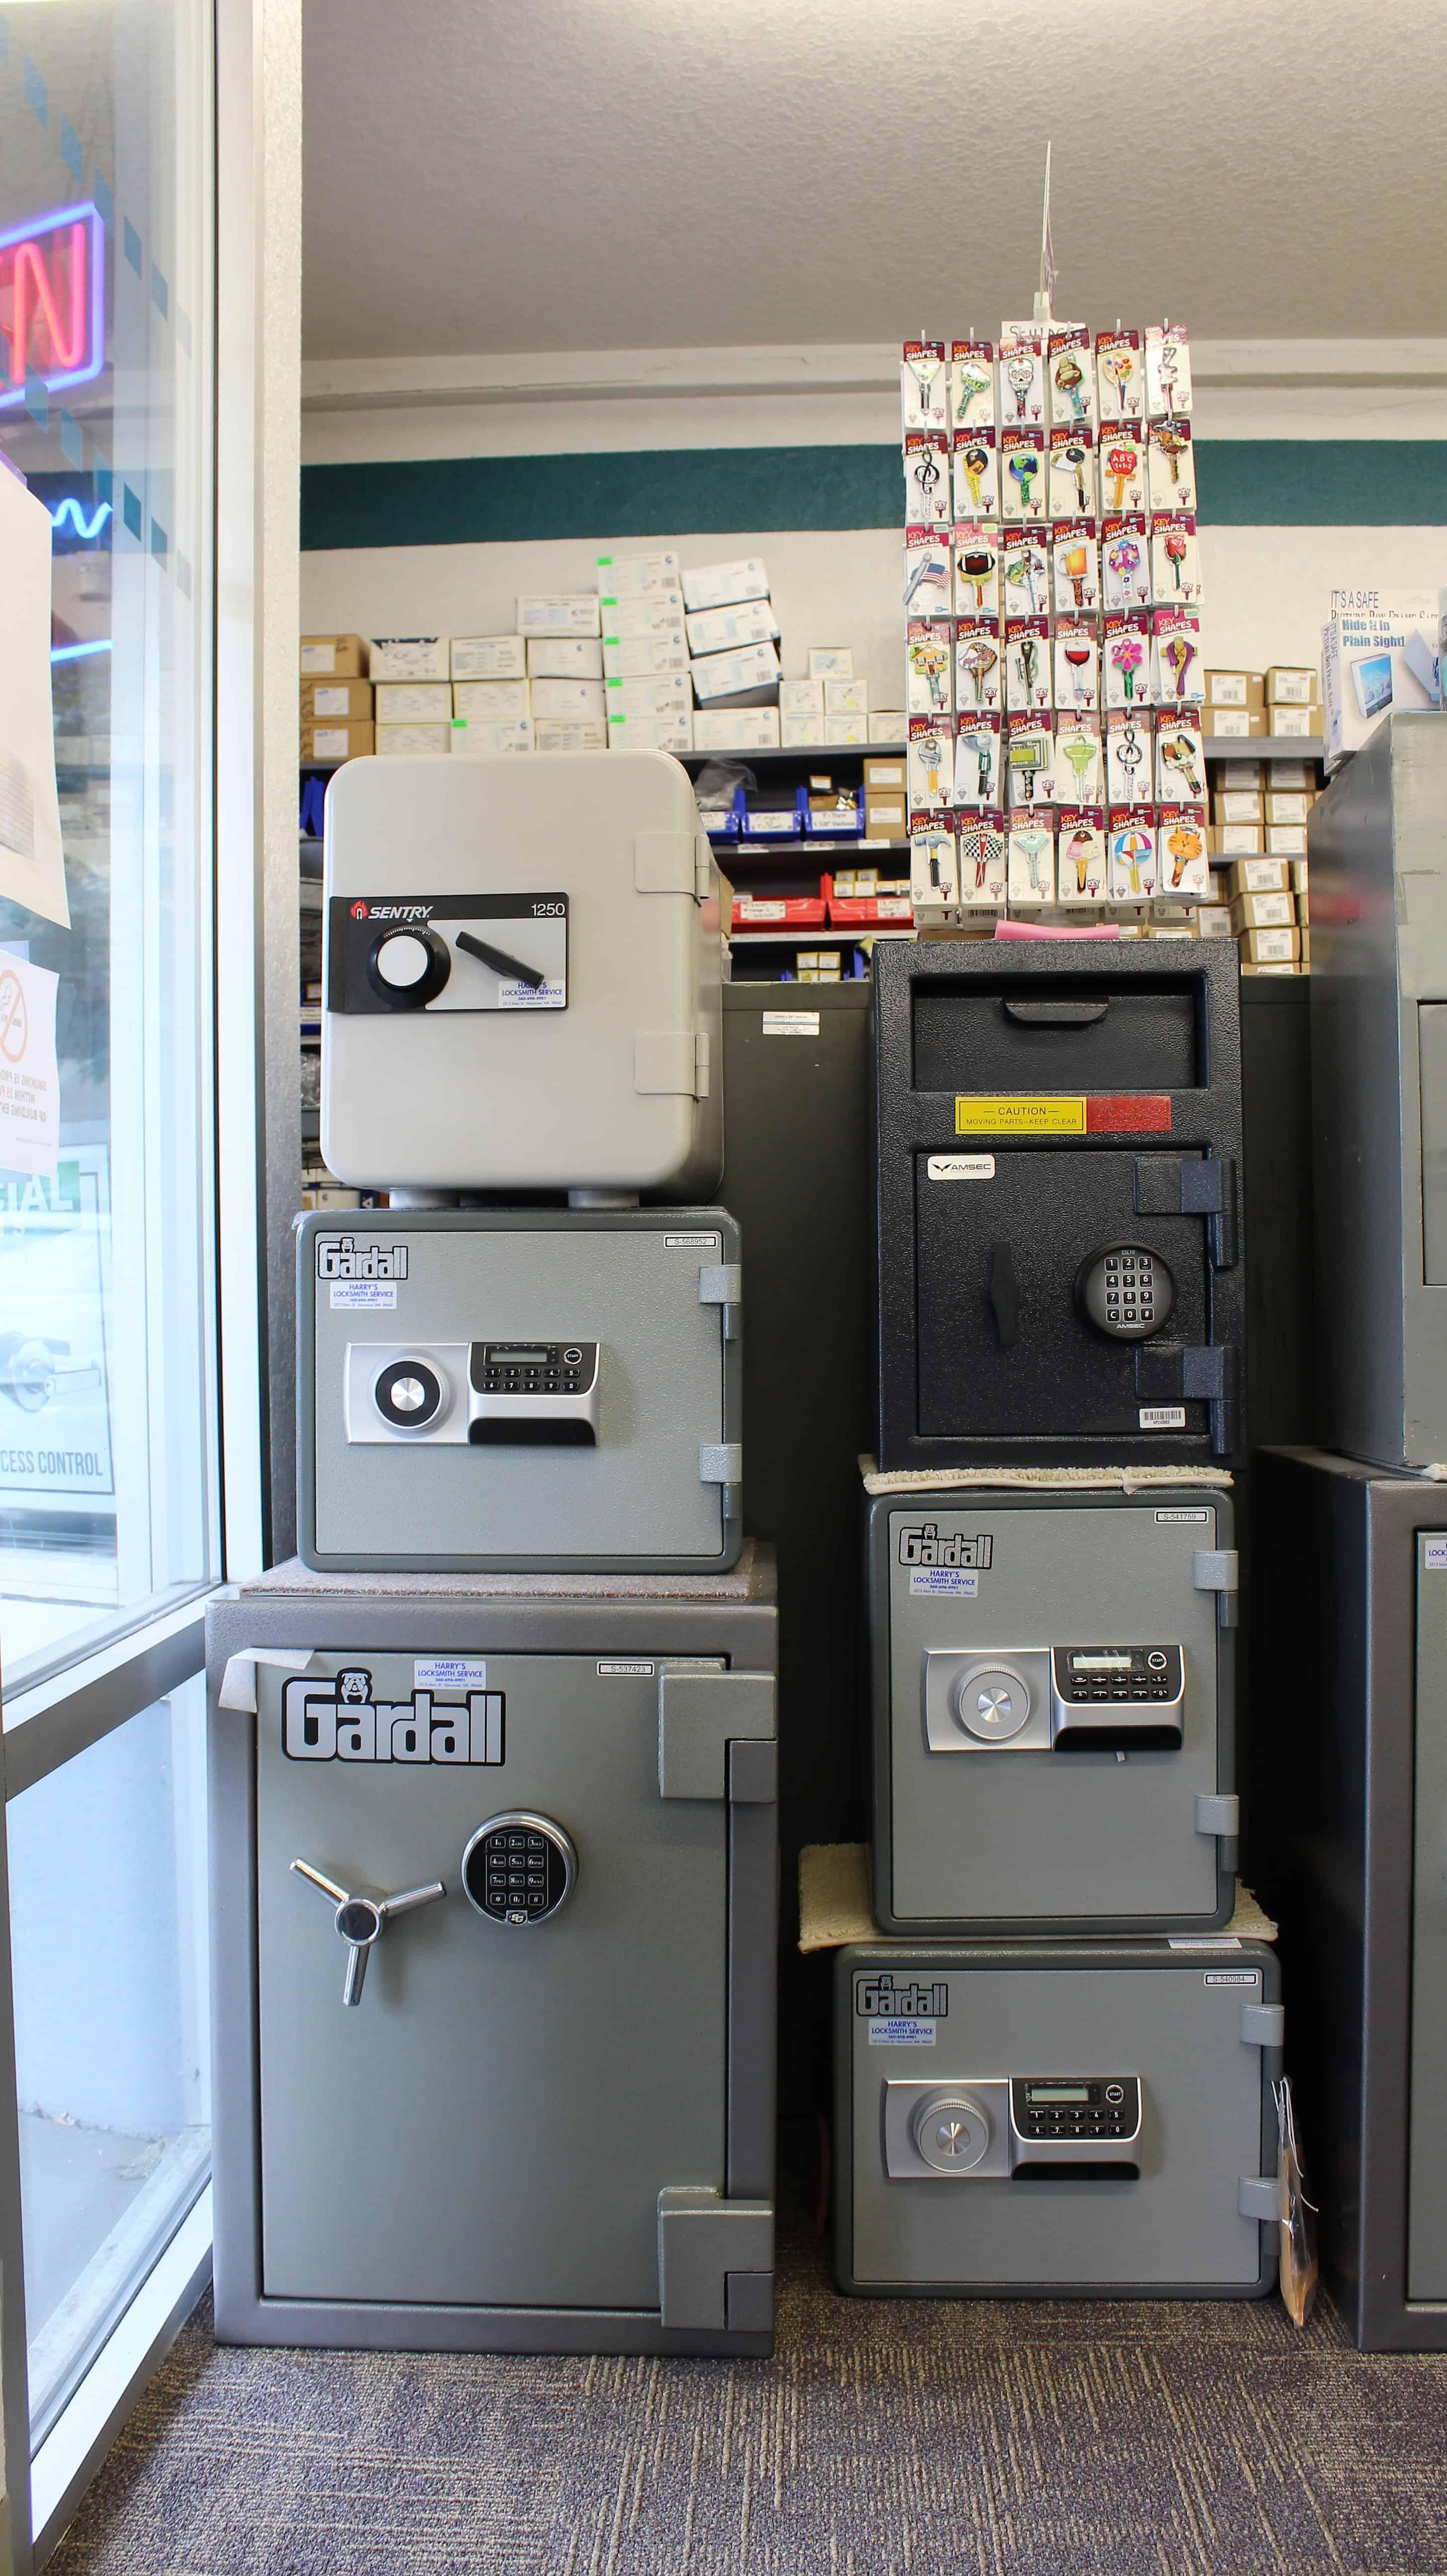 Gardall Amsec safes for sale